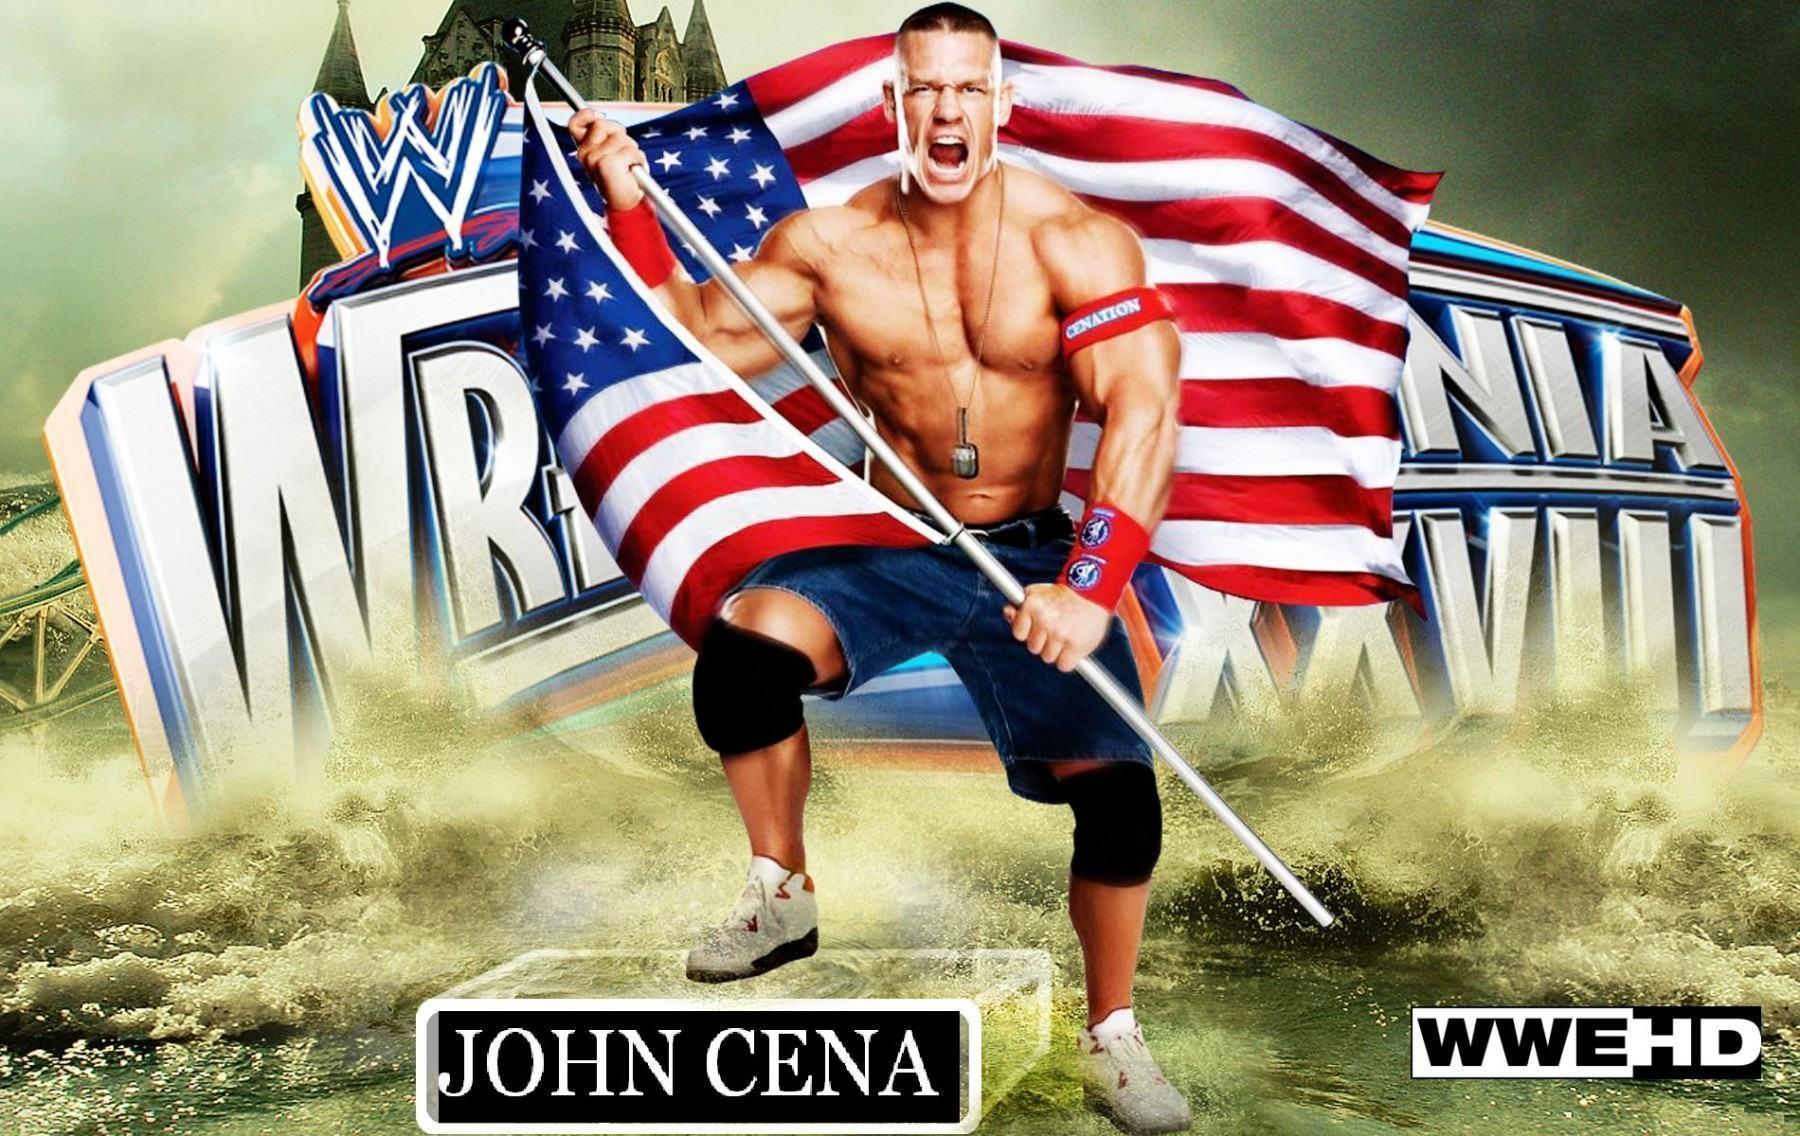 John Cena Body Wallpapers 2016 - Wallpaper Cave